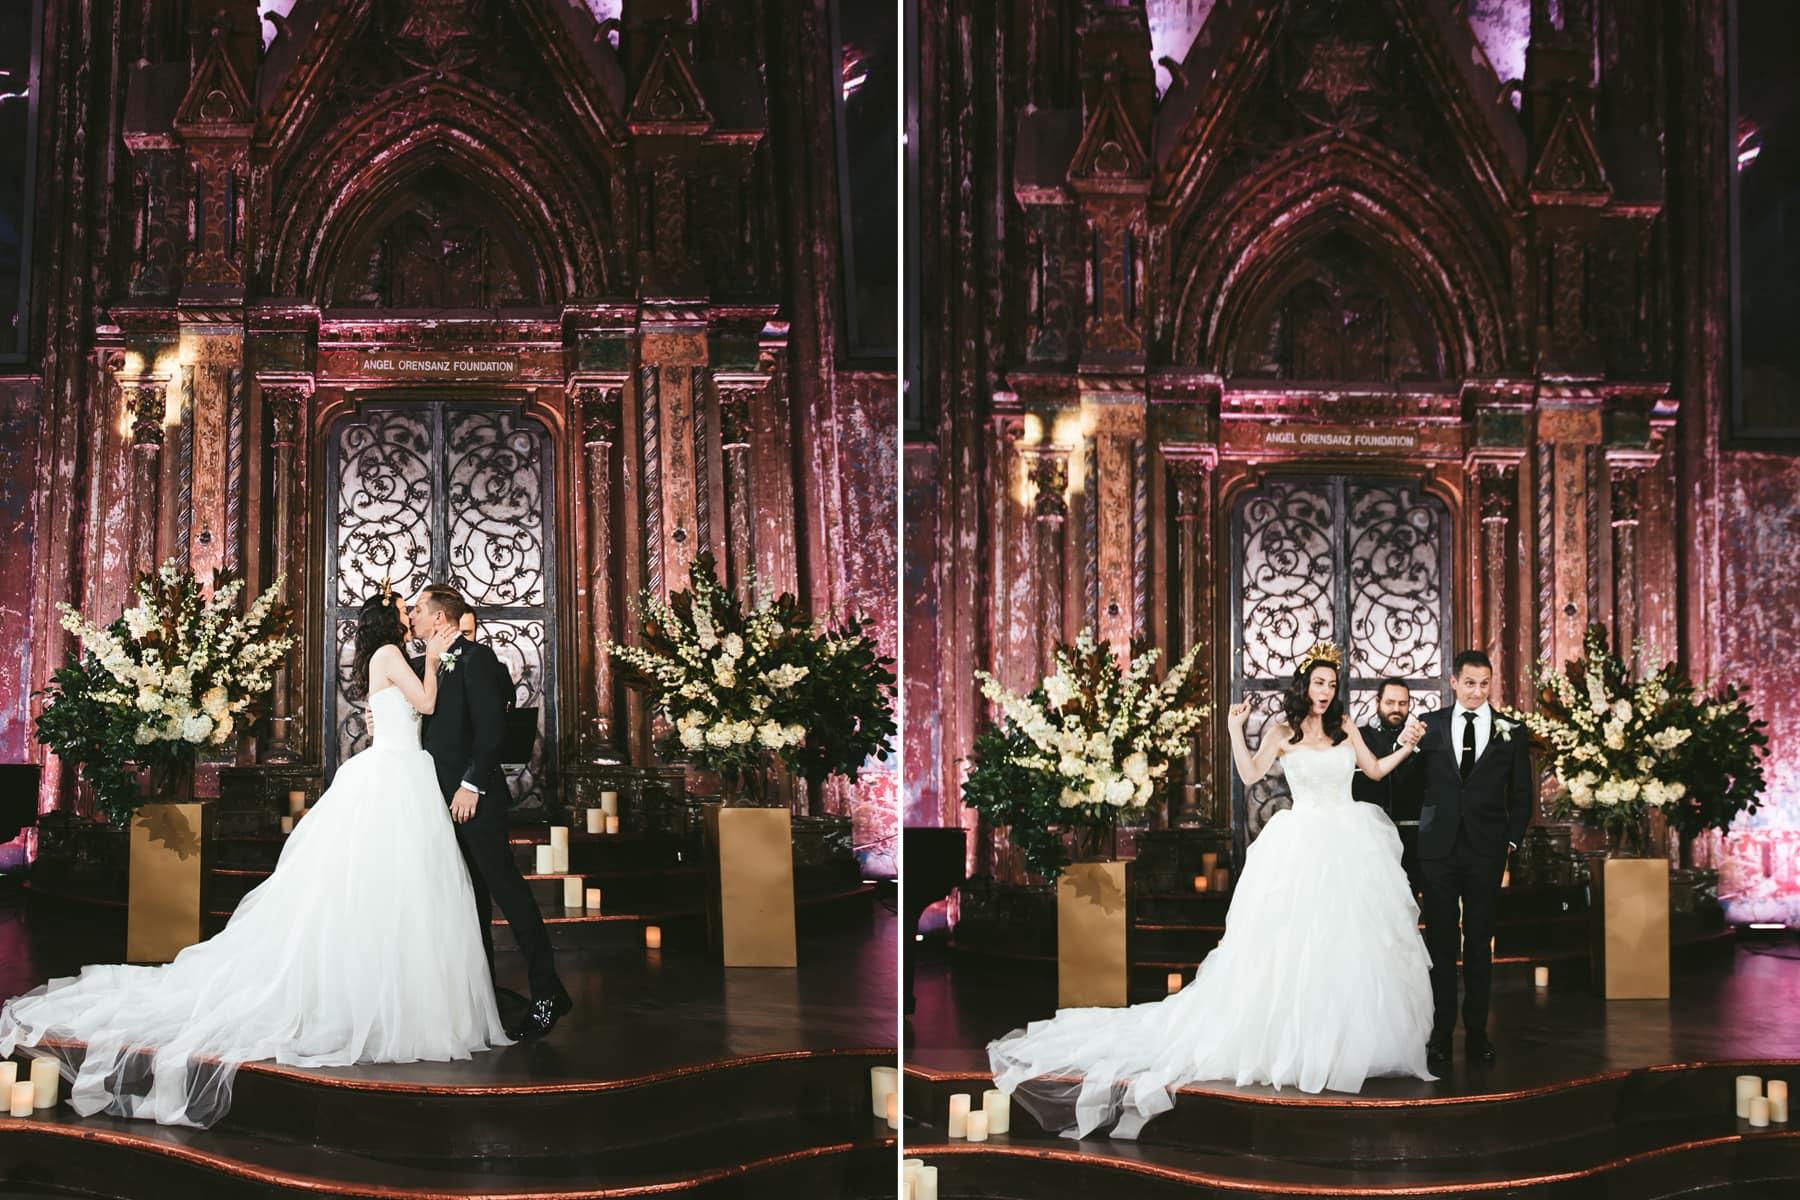 Angel Orensanz Foundation Wedding phtographer